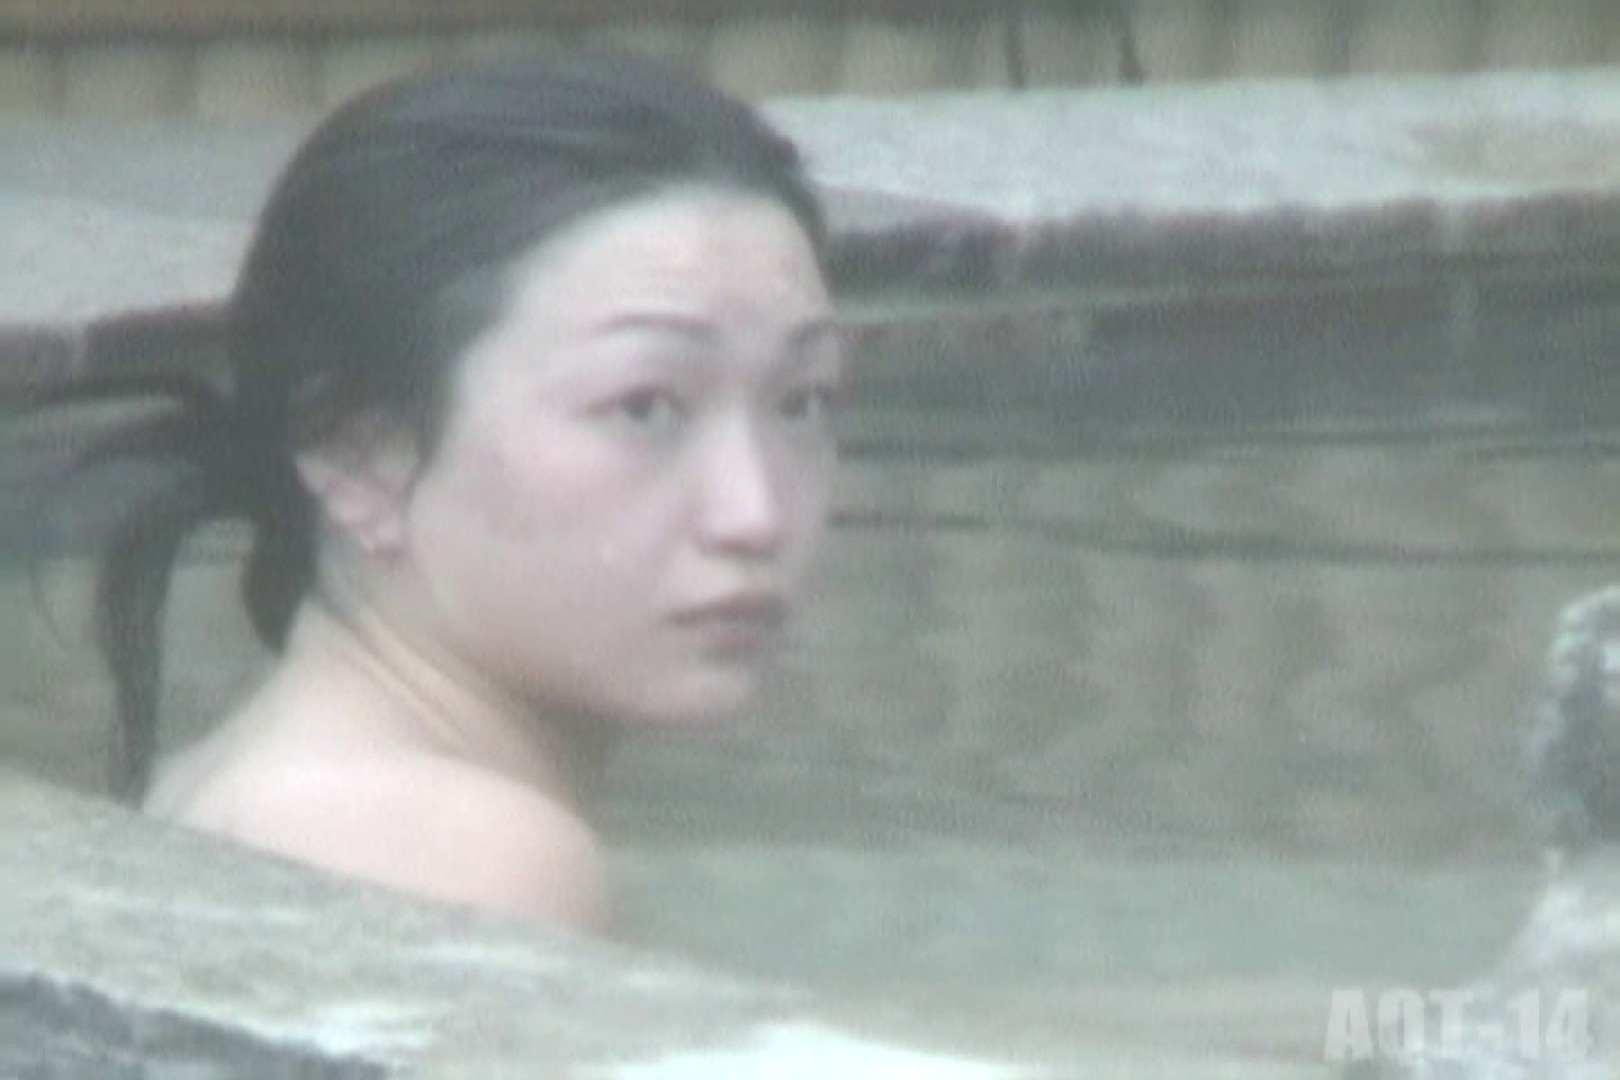 Aquaな露天風呂Vol.826 盗撮 | OLエロ画像  88PICs 85